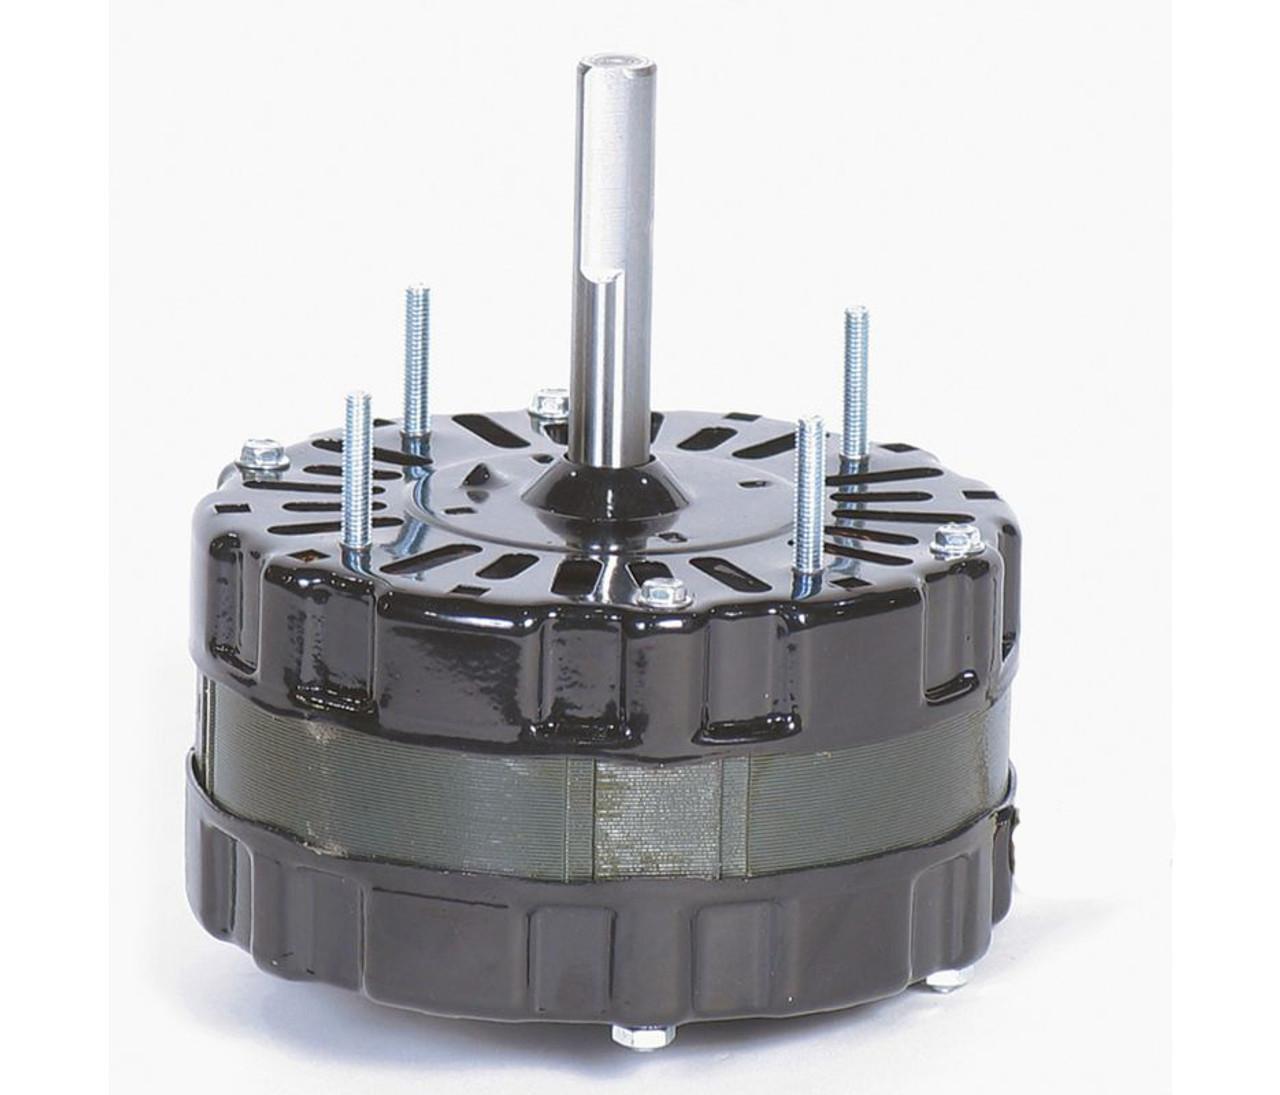 Dayton Unit Heater Motor A0516B2595 1/10 hp 1300 RPM 3.55 amps 120V on